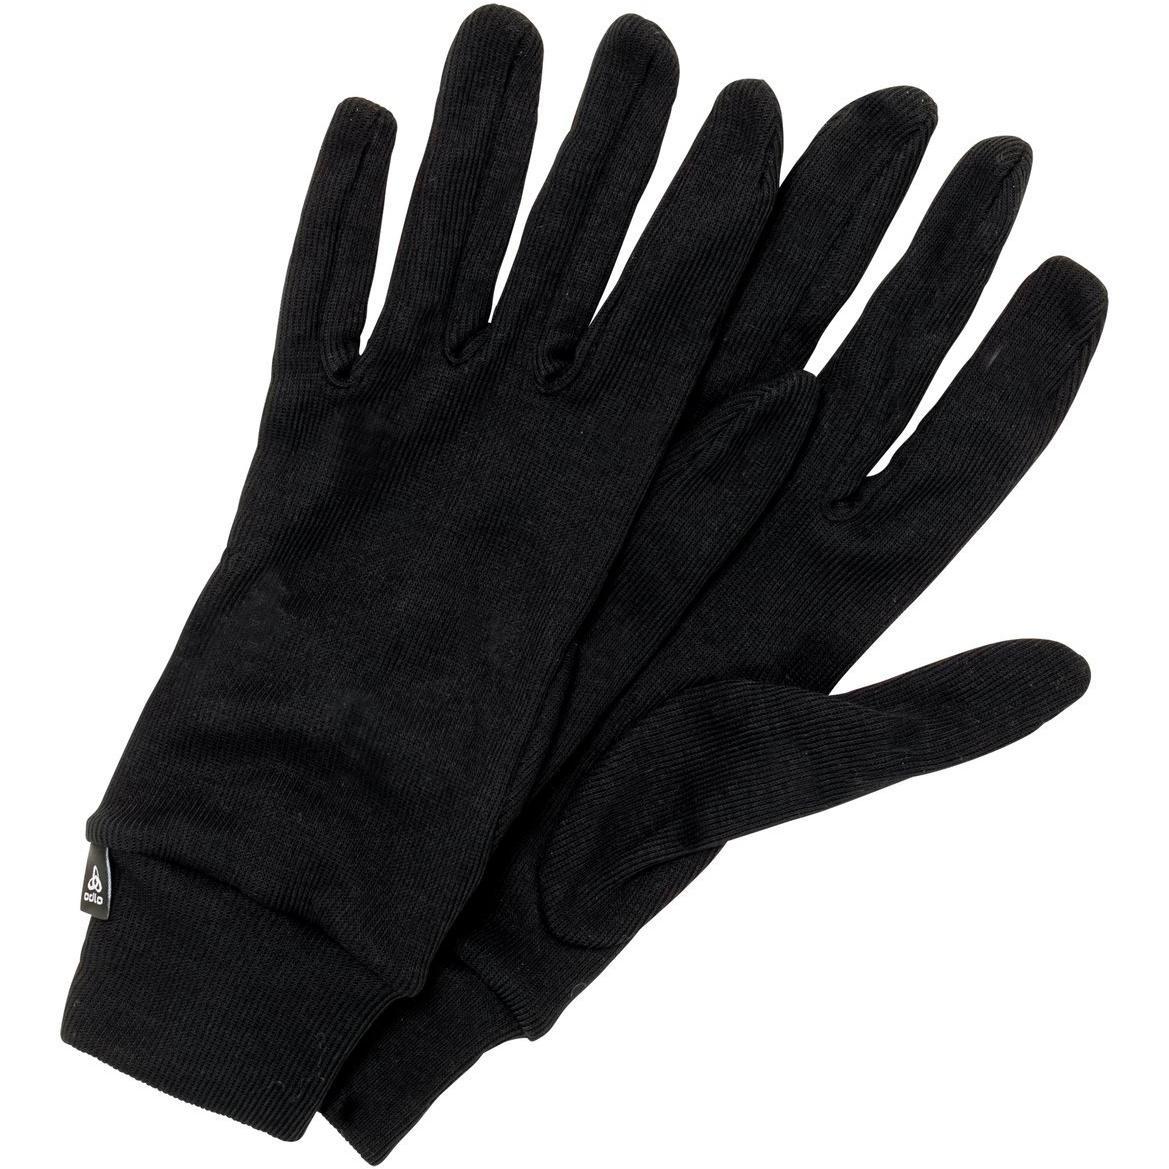 Produktbild von Odlo The Active Warm ECO Handschuhe 762740 - 15000 black